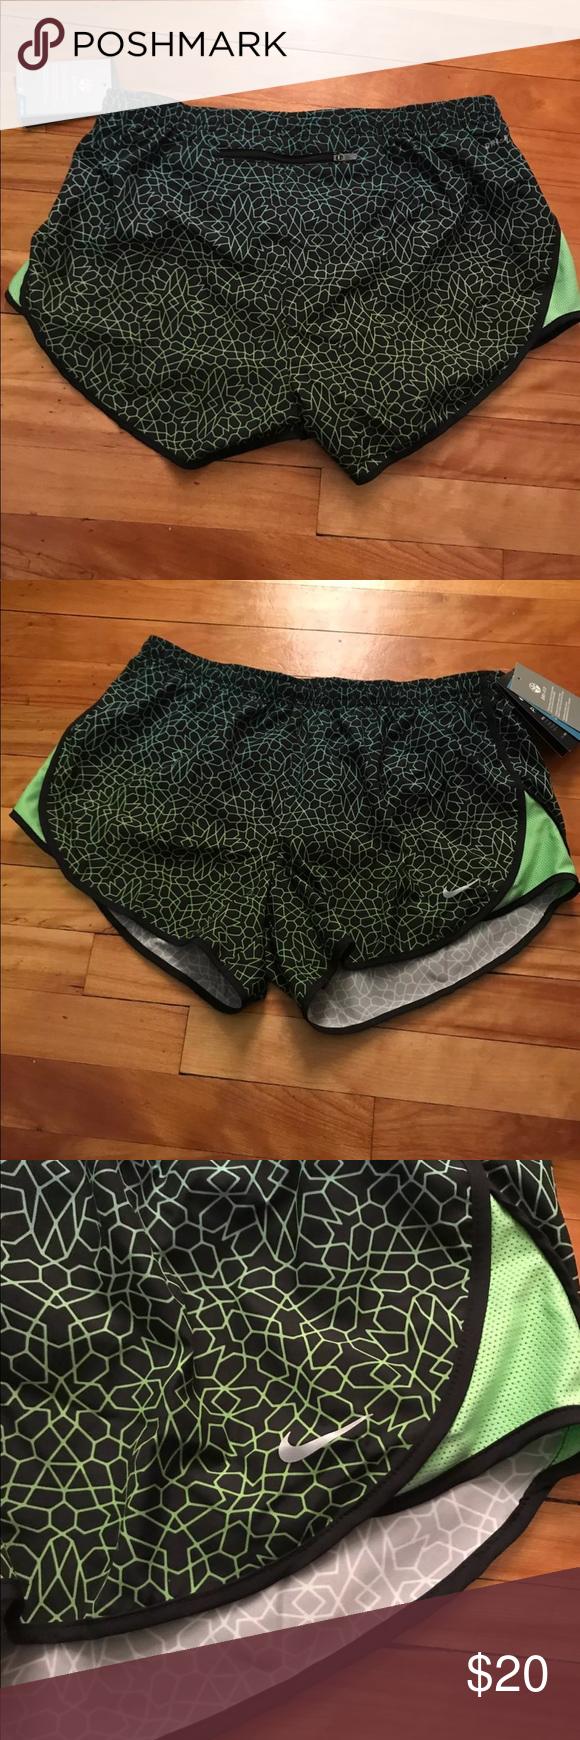 8cffac86cd NWT Nike Shorts Women s M Brand new with tag Nike Shorts Size M Nike Shorts